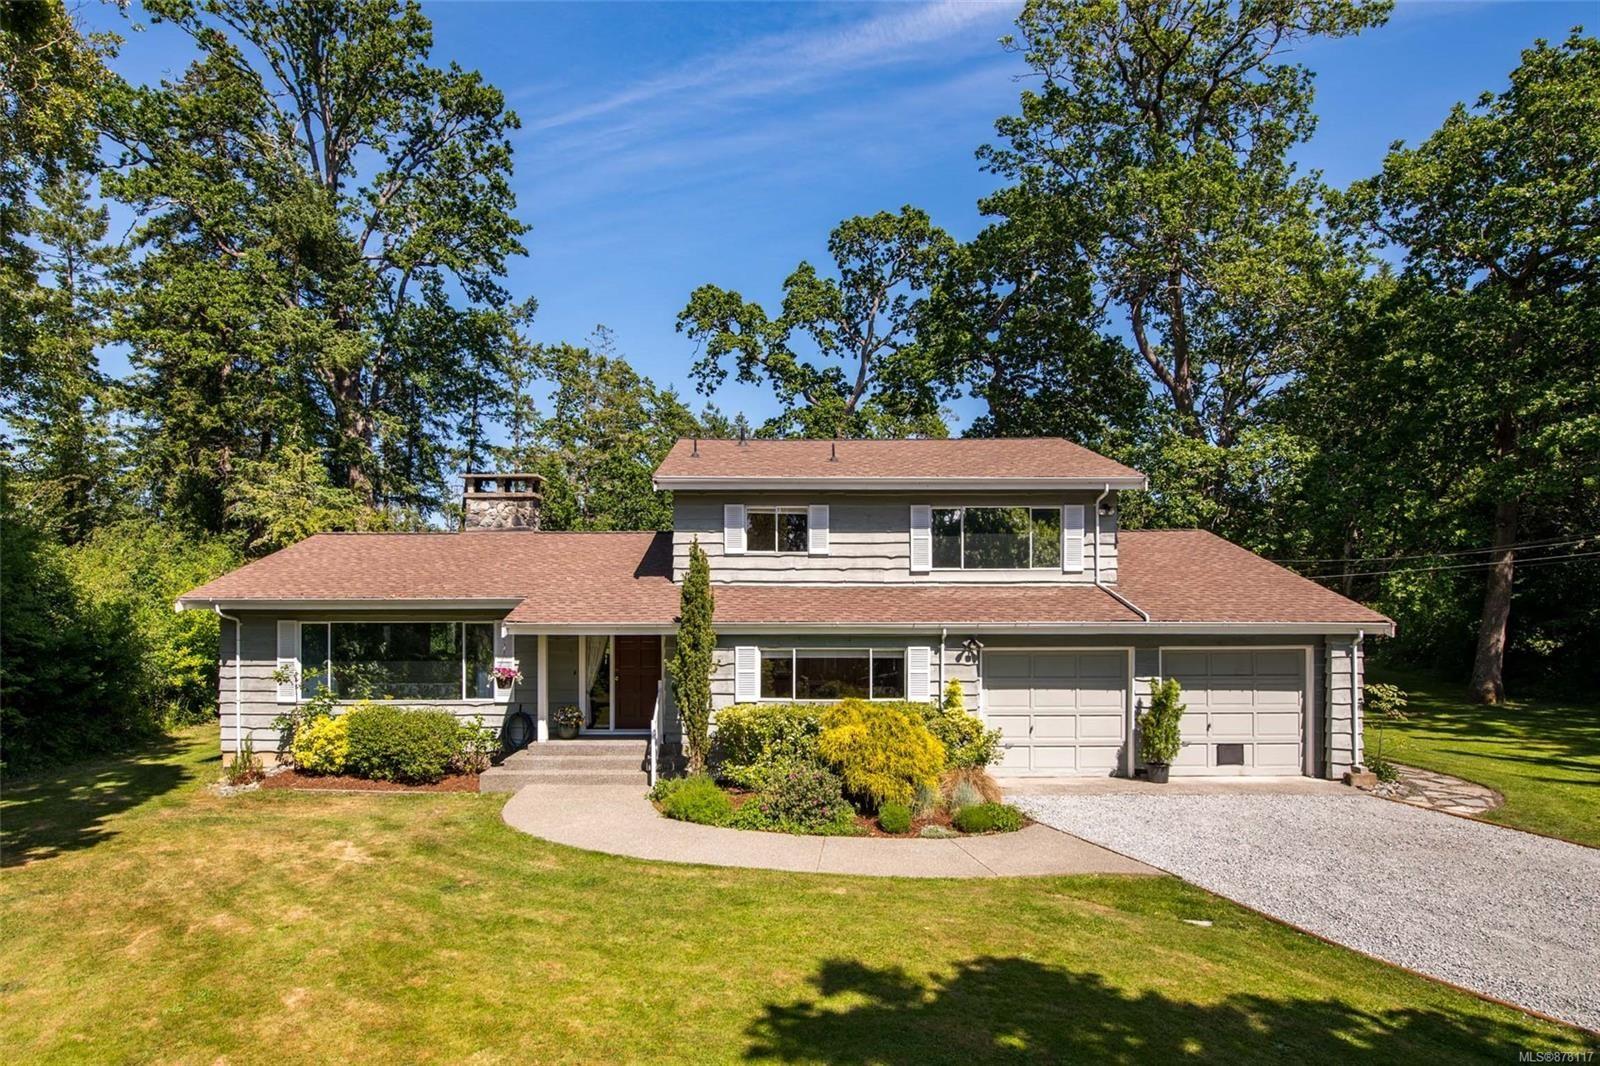 Main Photo: 10215 Tsaykum Rd in : NS Sandown House for sale (North Saanich)  : MLS®# 878117